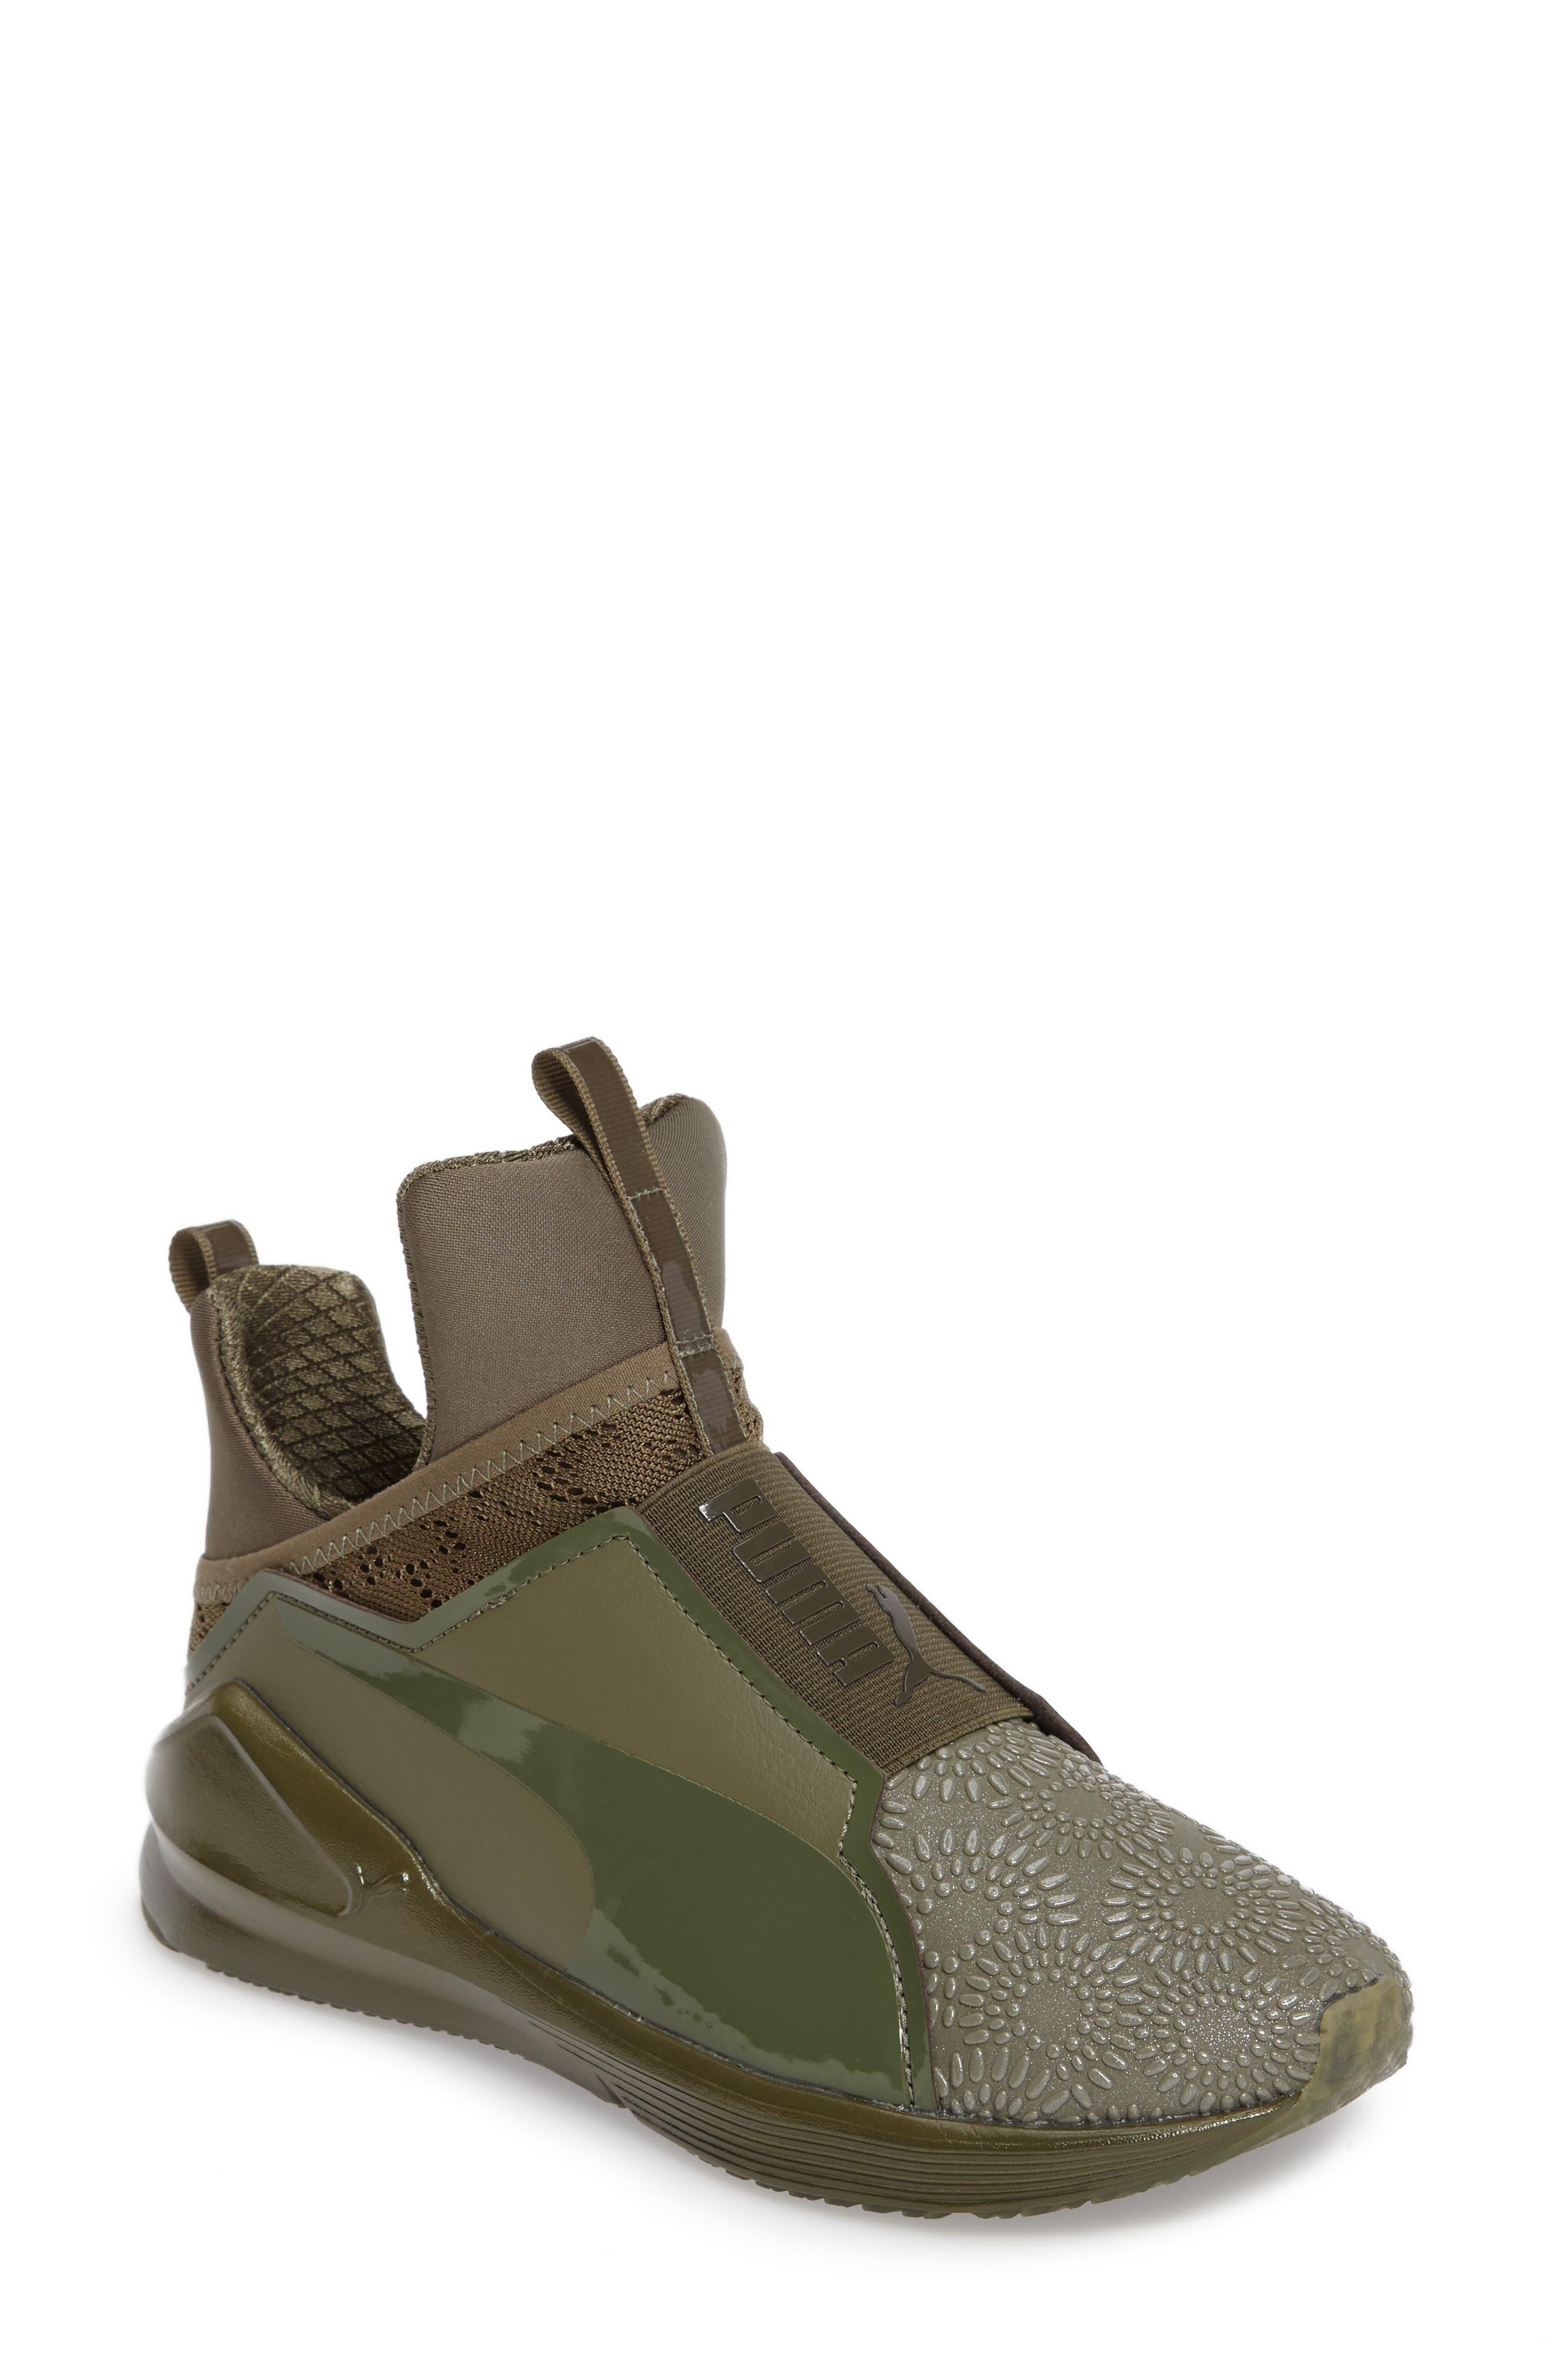 Fierce KRM High Top Sneaker,                         Main,                         color,